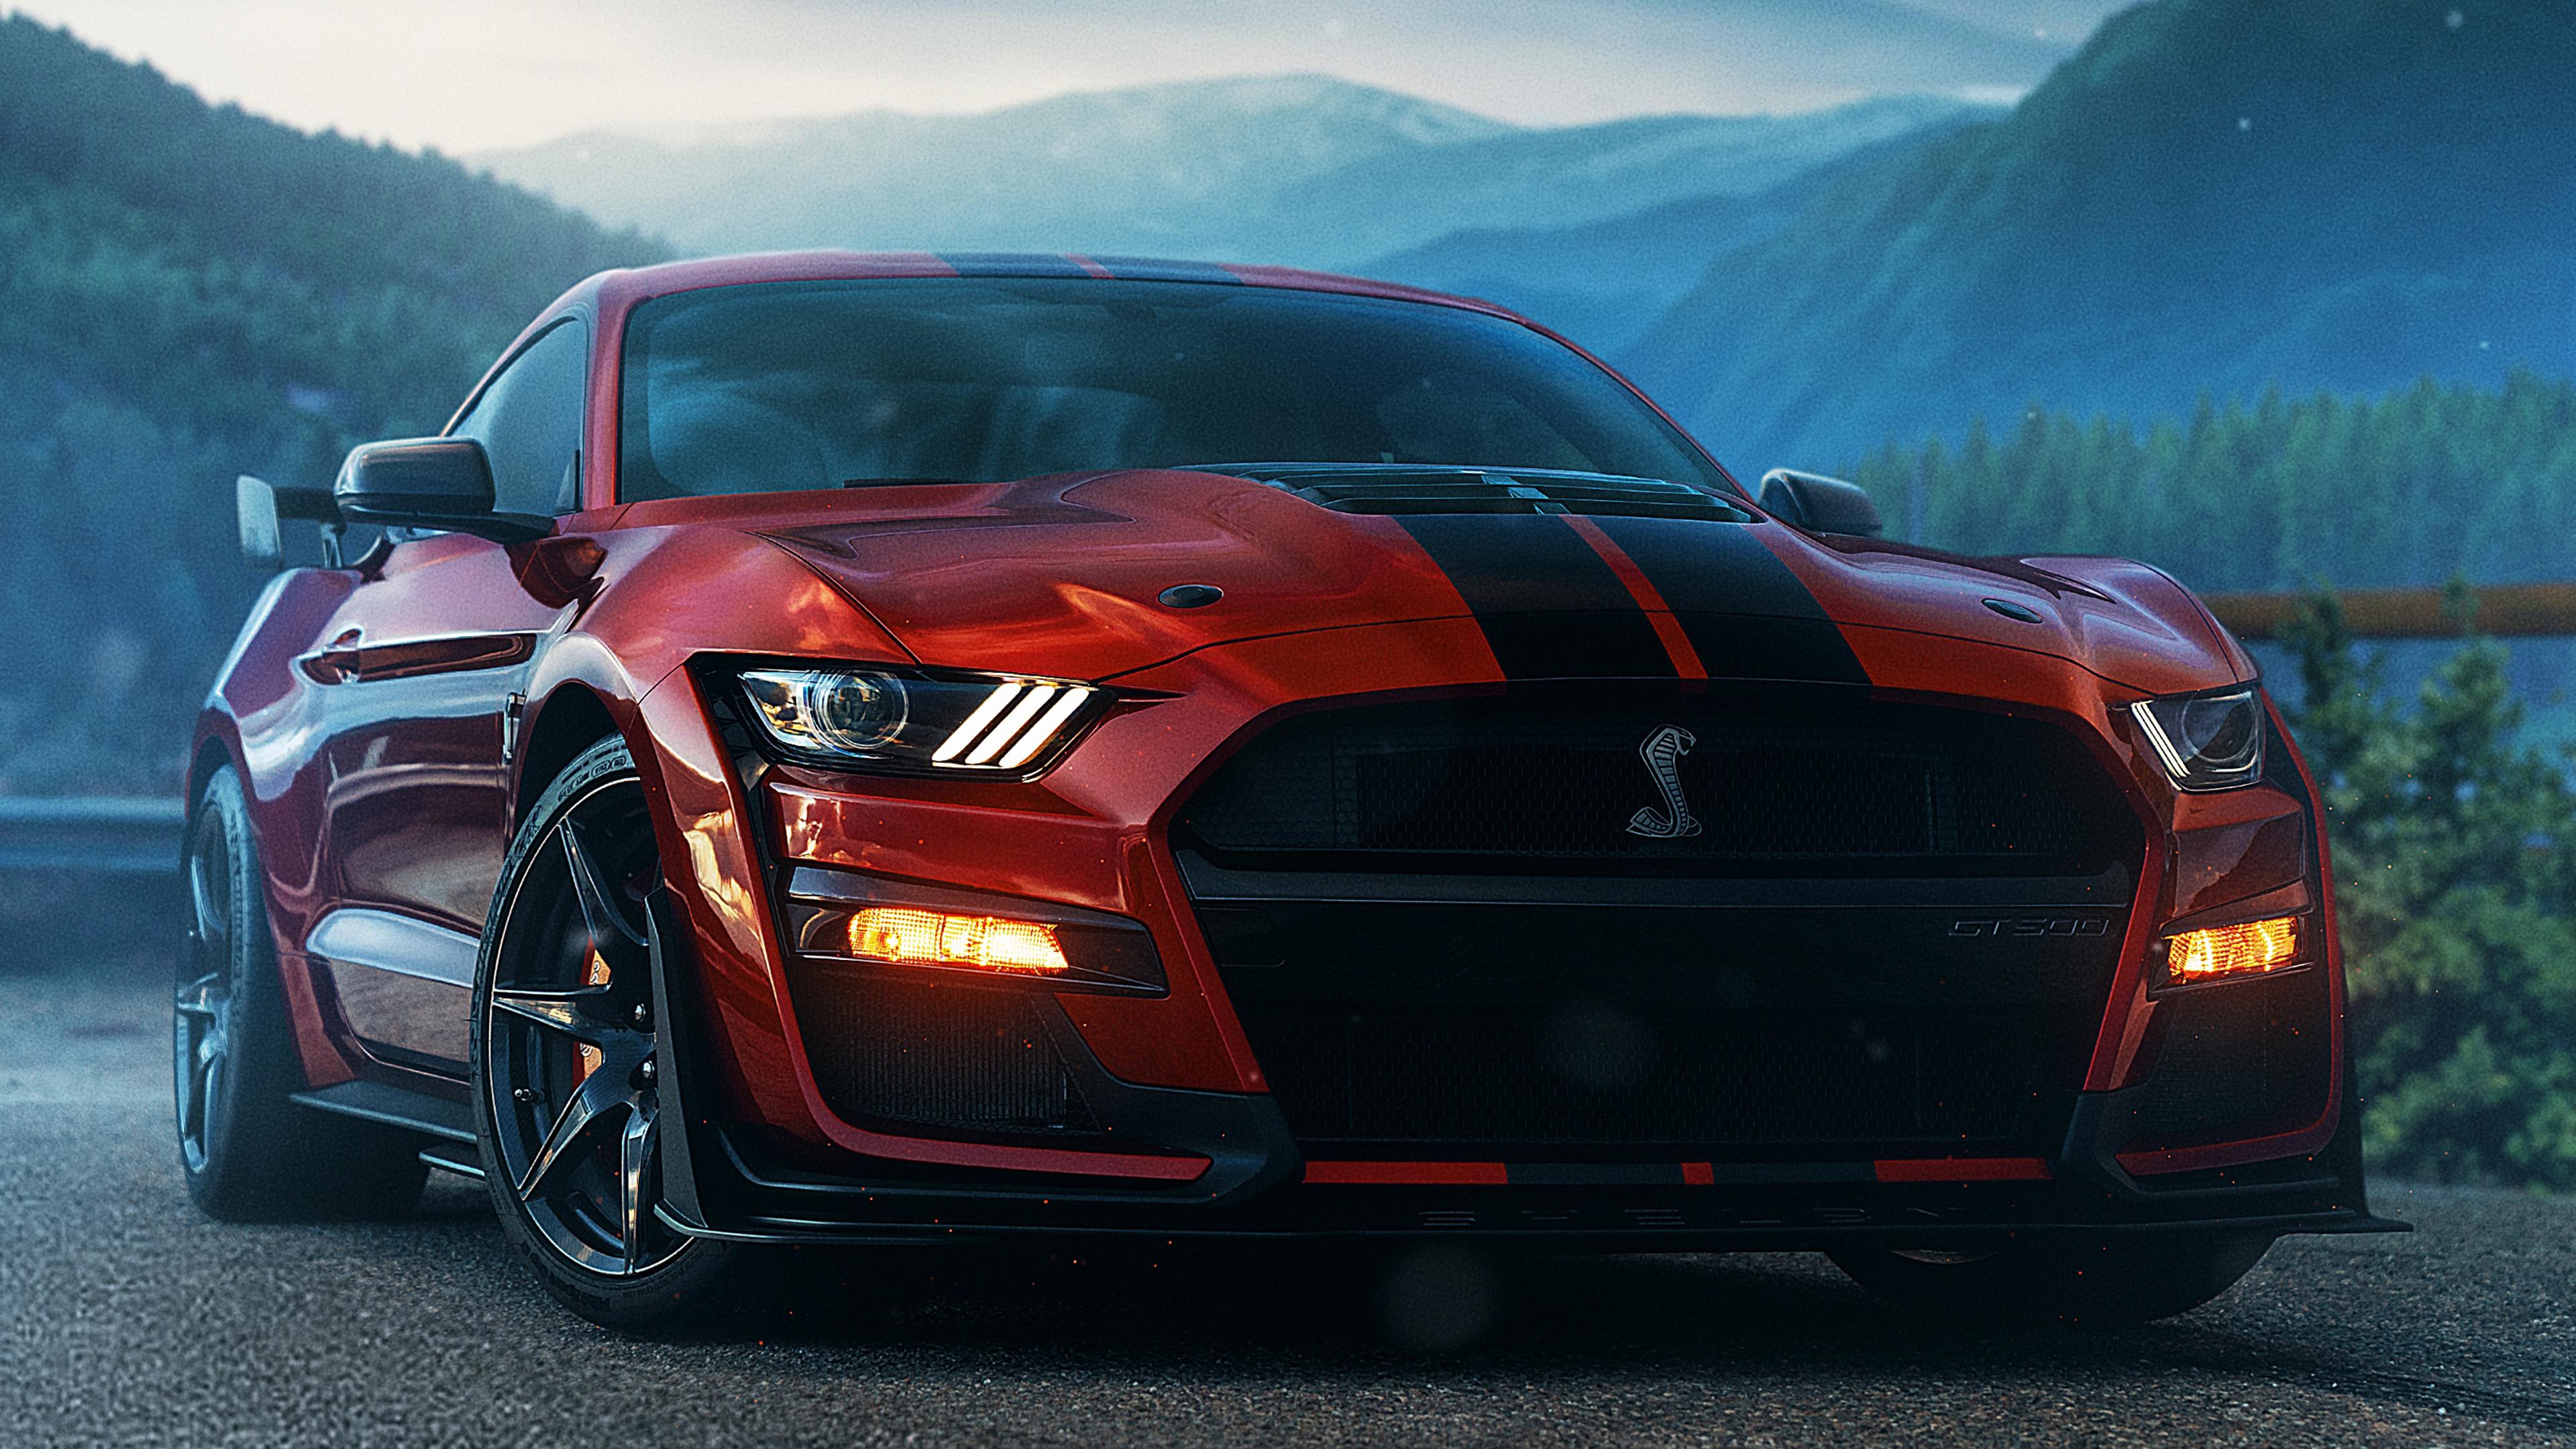 3840x2160 Ford Mustang Gt 4k 2020 4k HD 4k Wallpapers ...